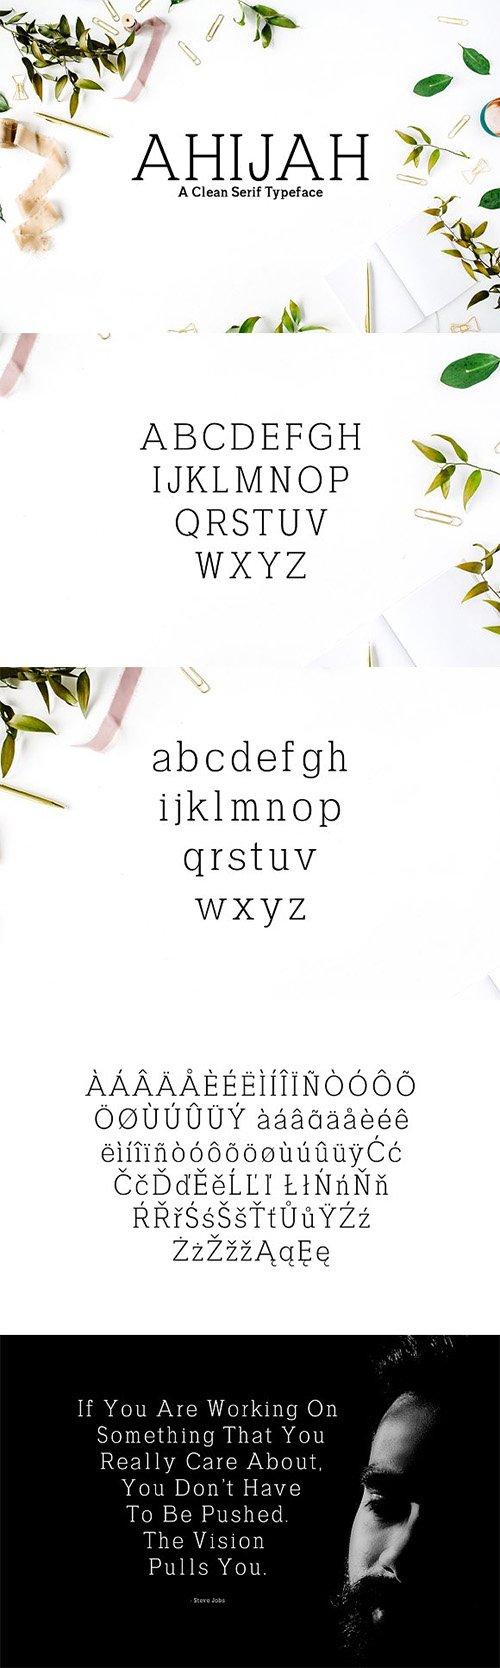 Ahijah A Clean Serif Font Family 1746672